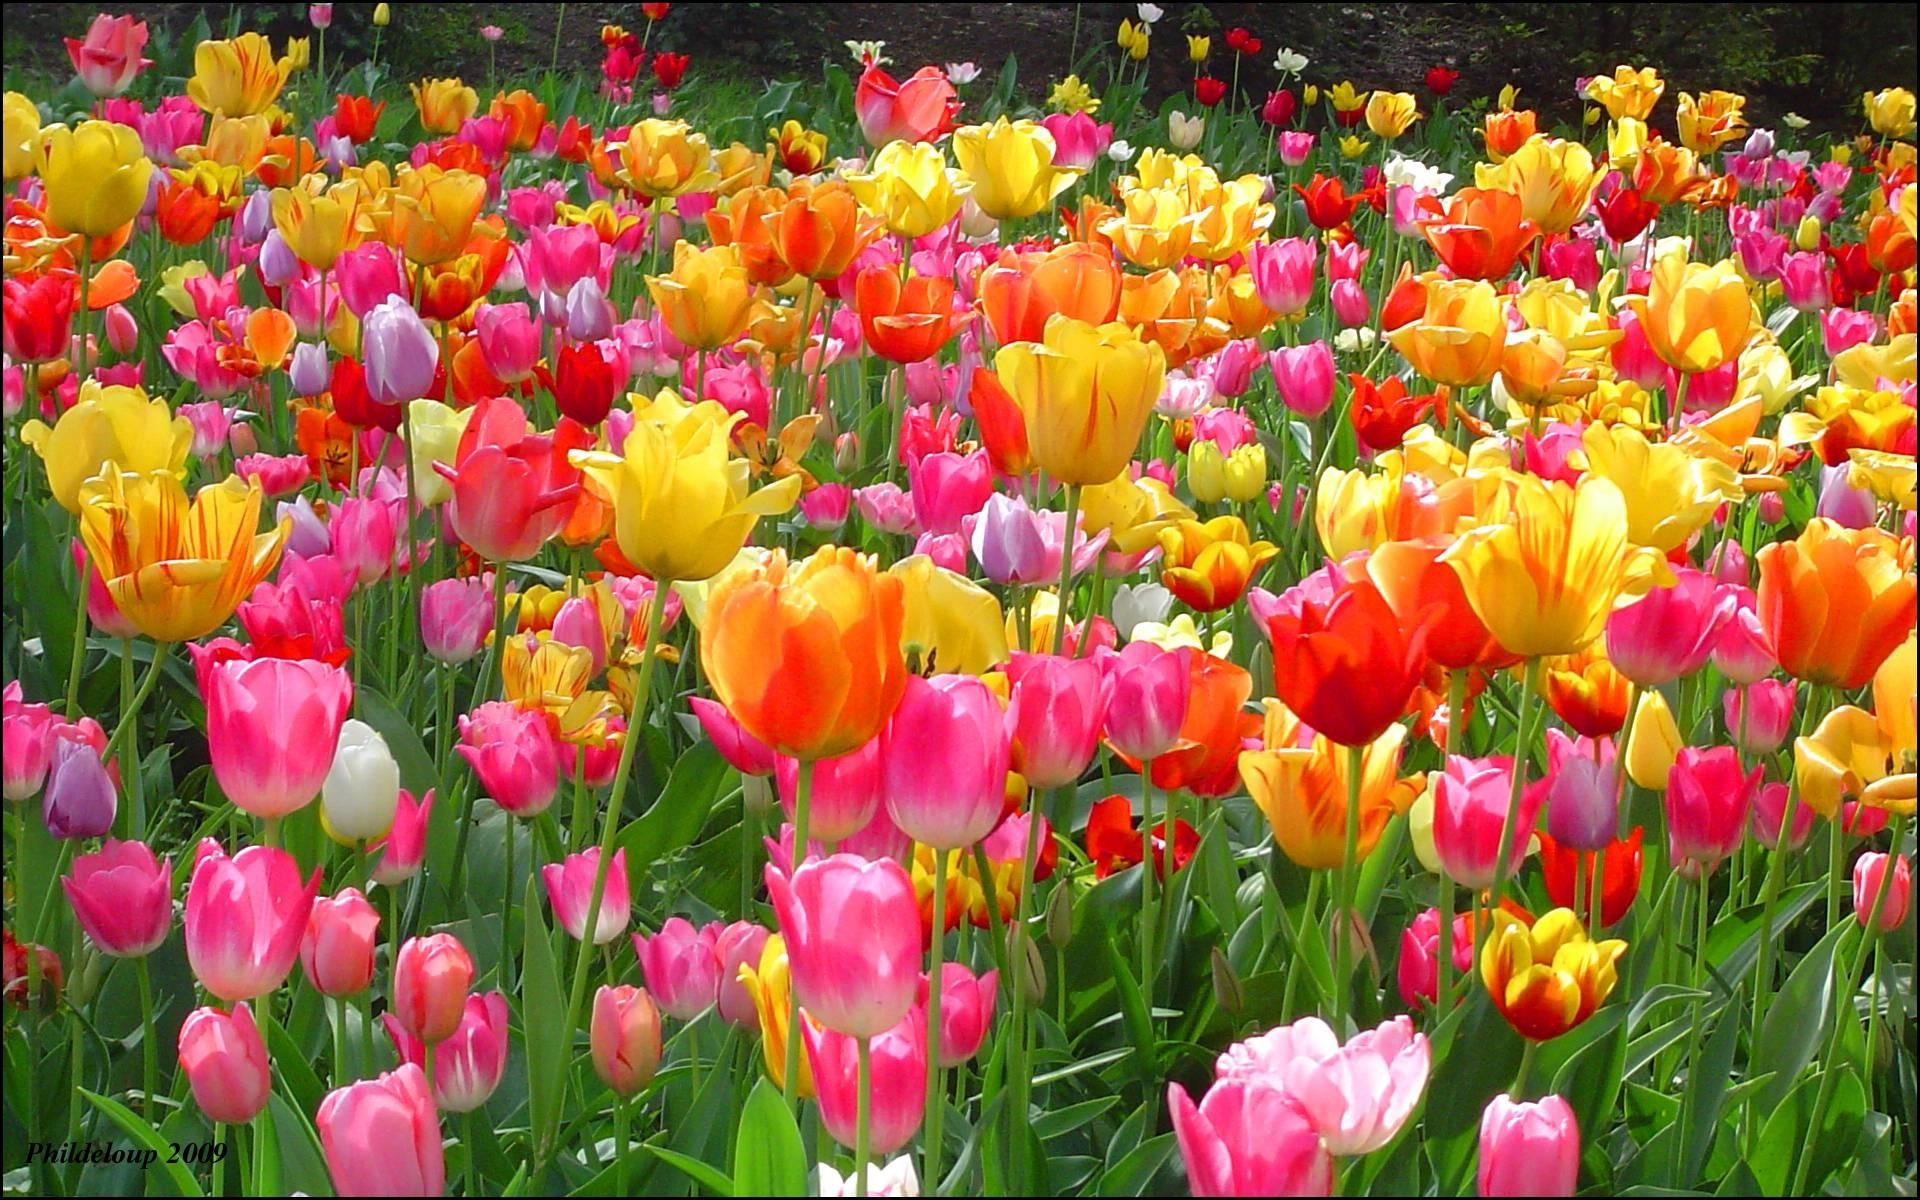 Tulip Wallpaper Backgrounds | Best Free Wallpaper